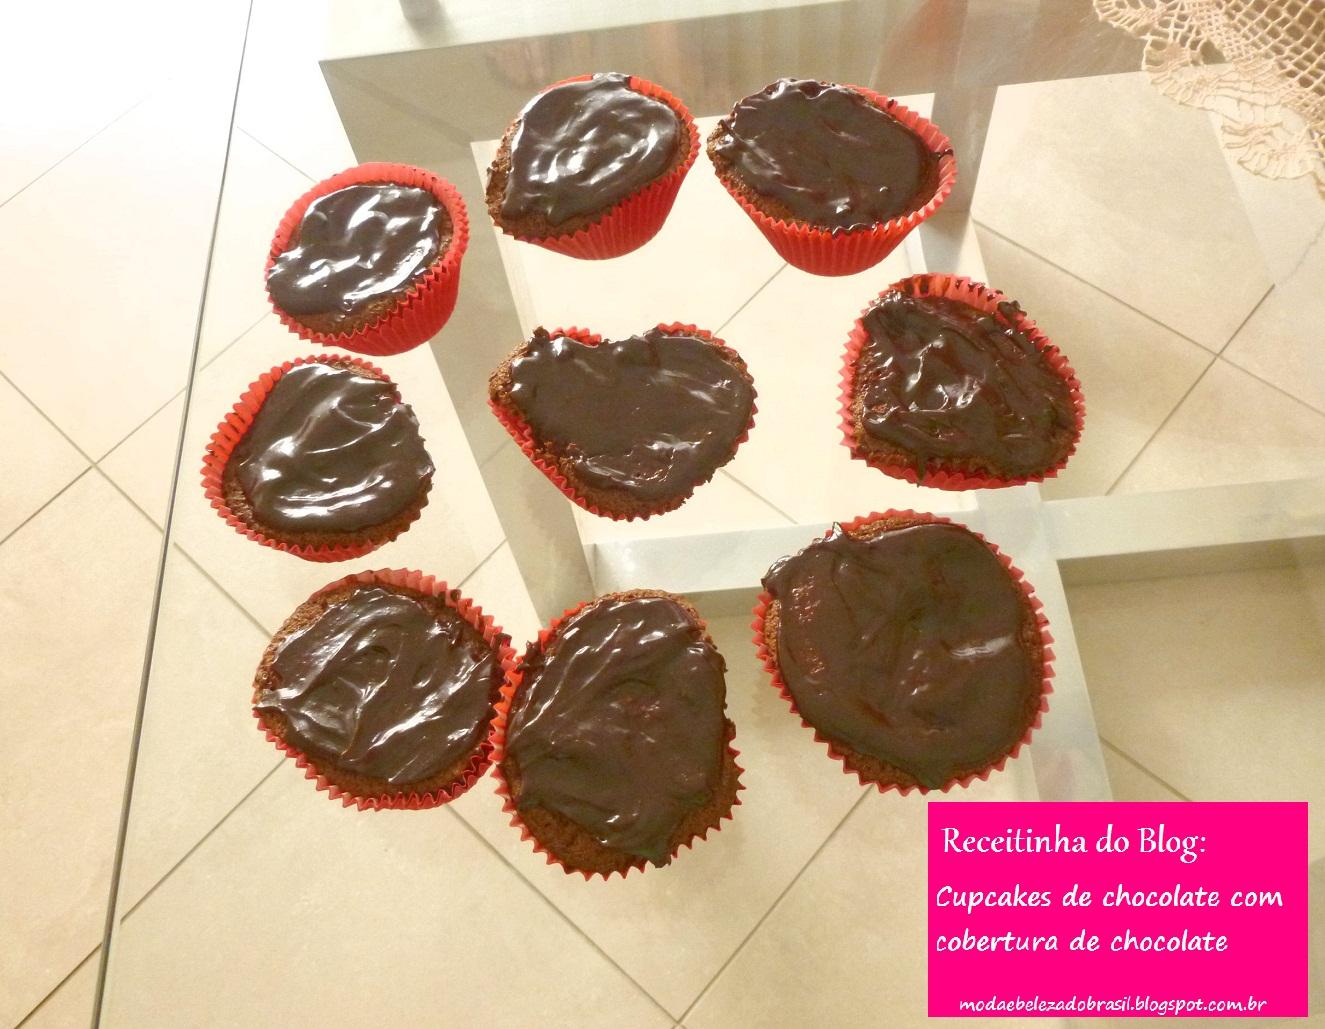 cupackes de chocolate cobertura de chocolate